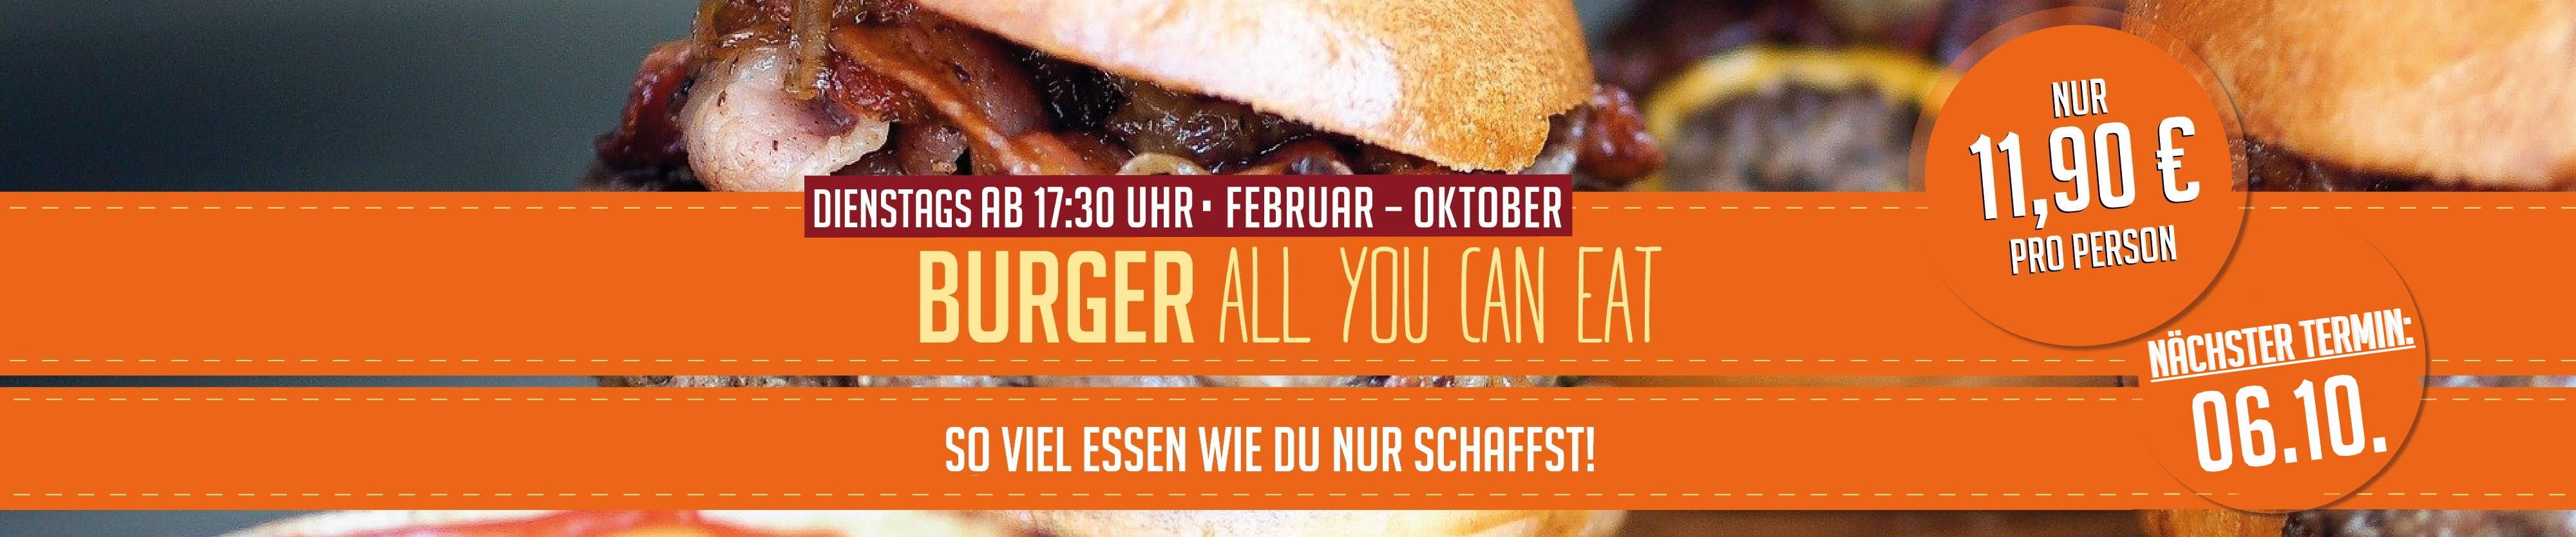 BNL_Burger_AYCE_HP_Banner_06102020